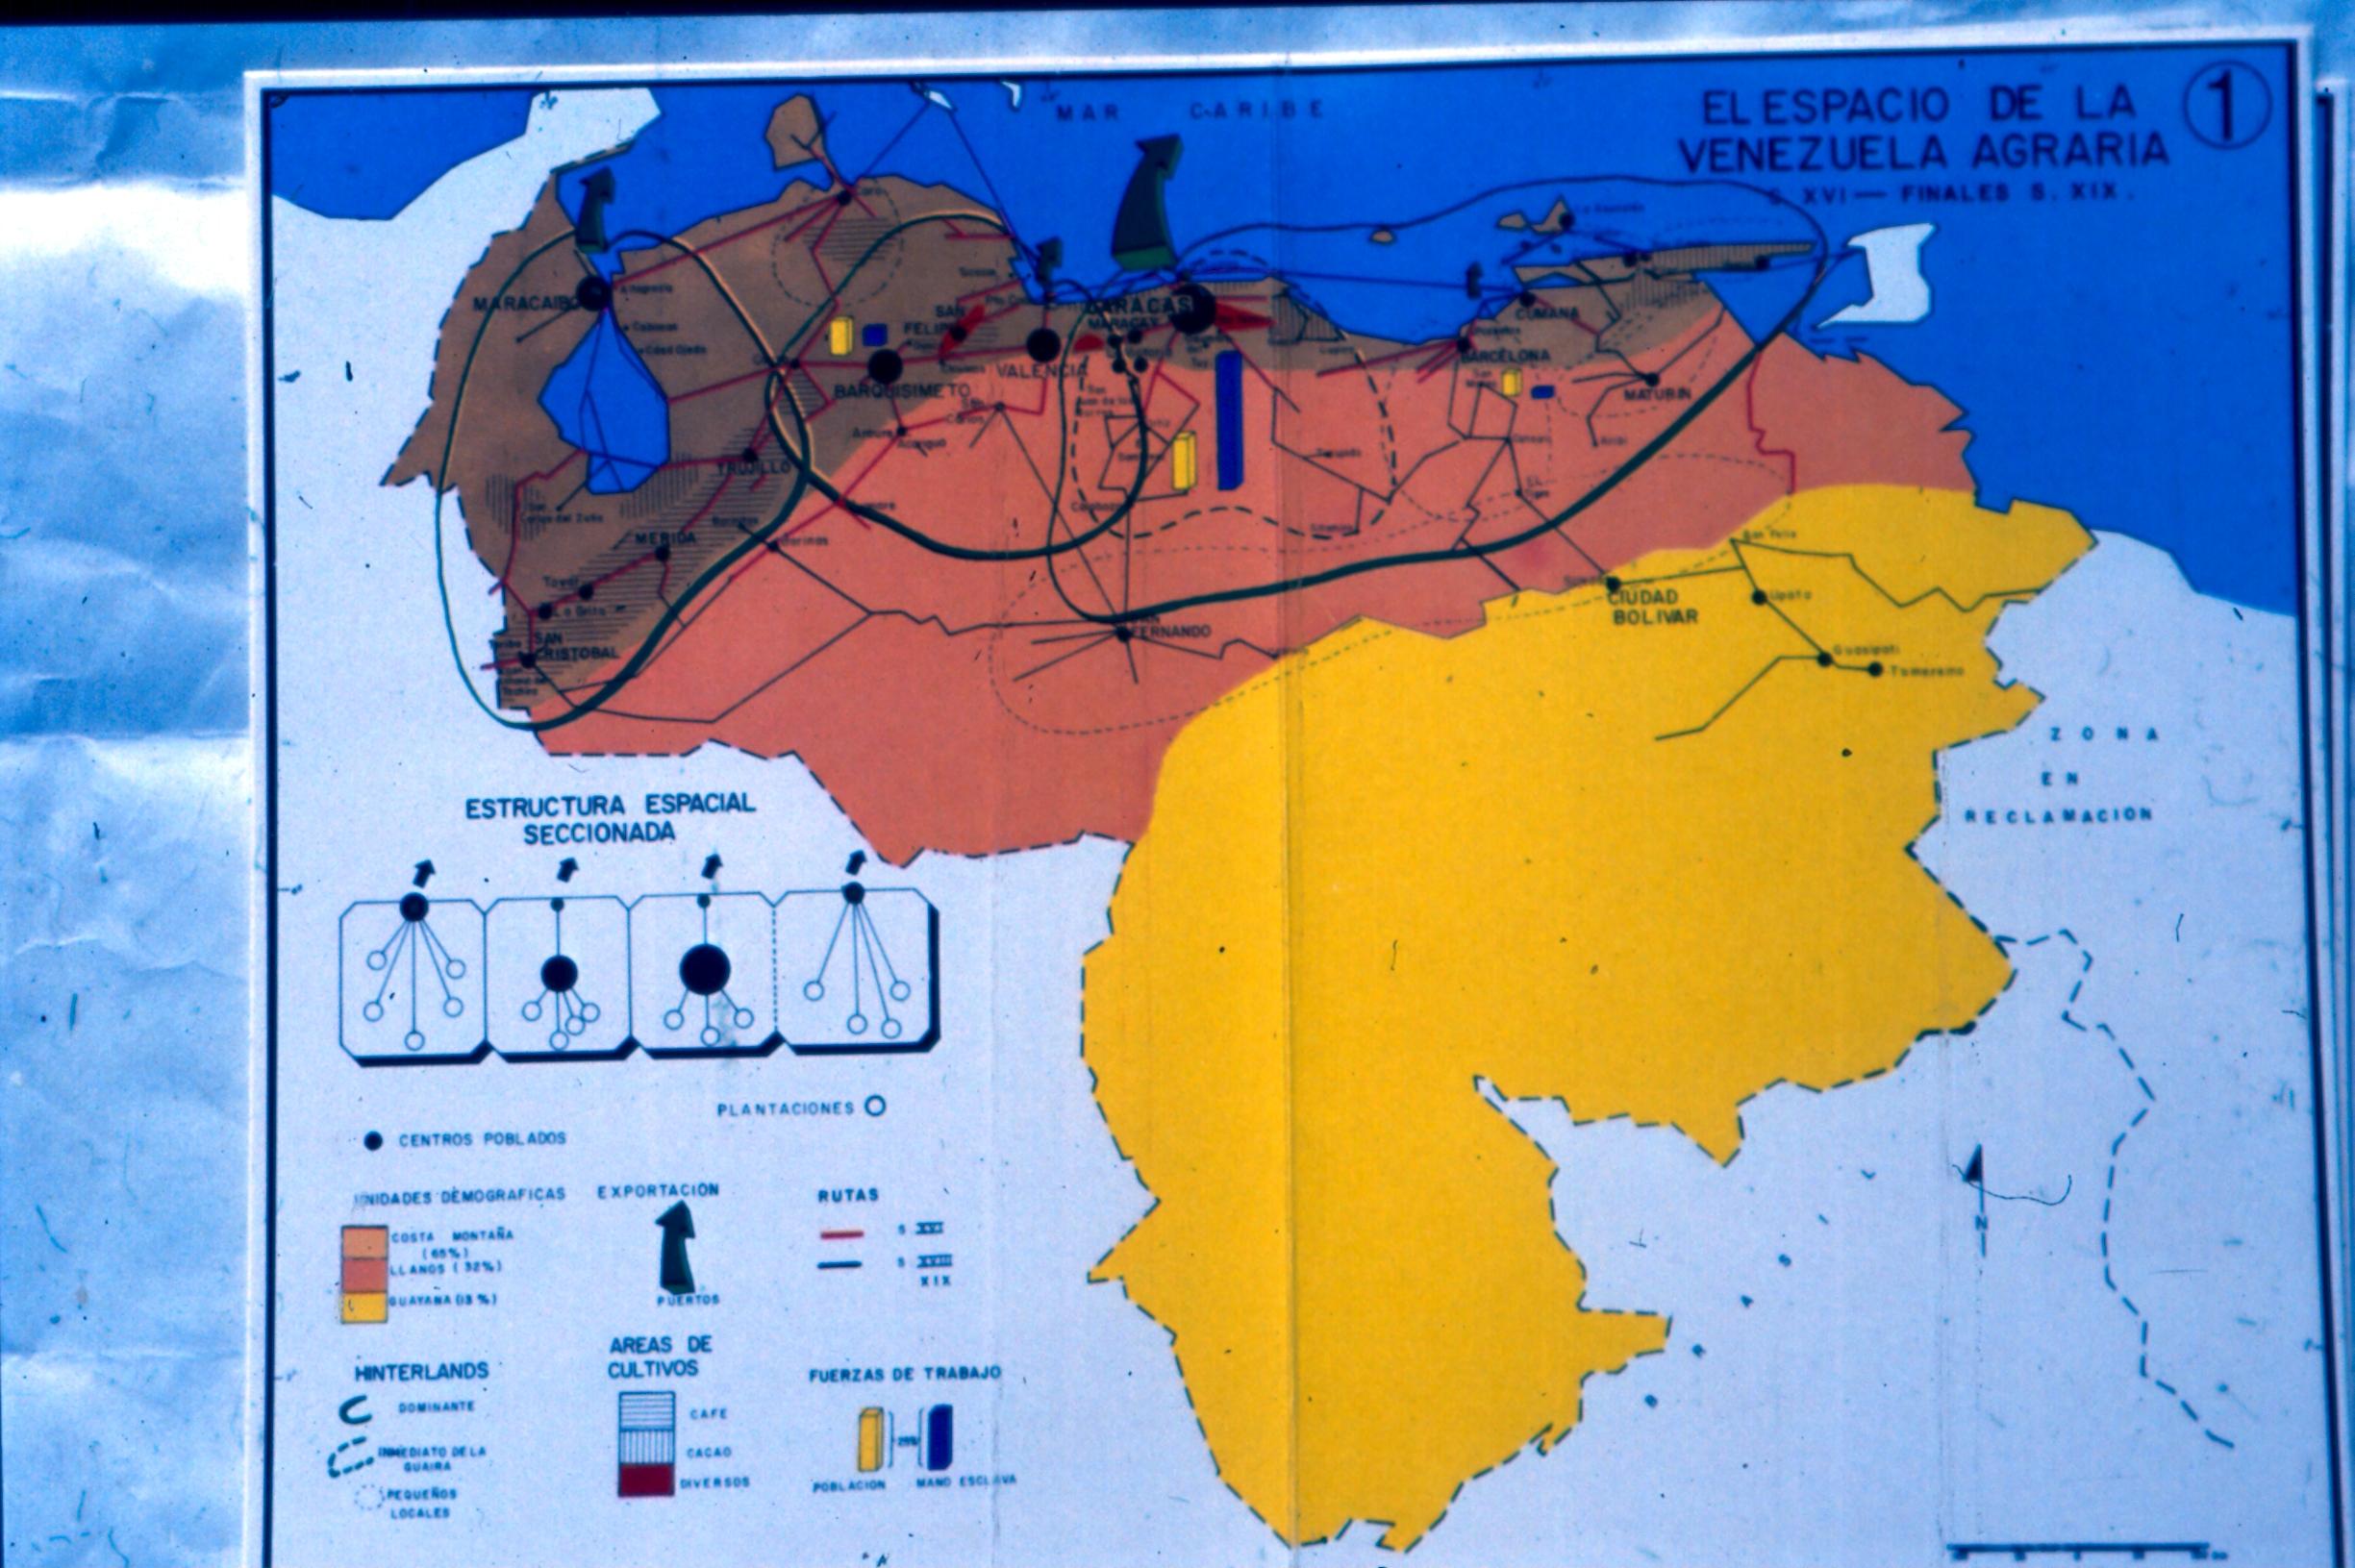 F-05005-Mapas-Venezuela-Caracas-B-Ceballos